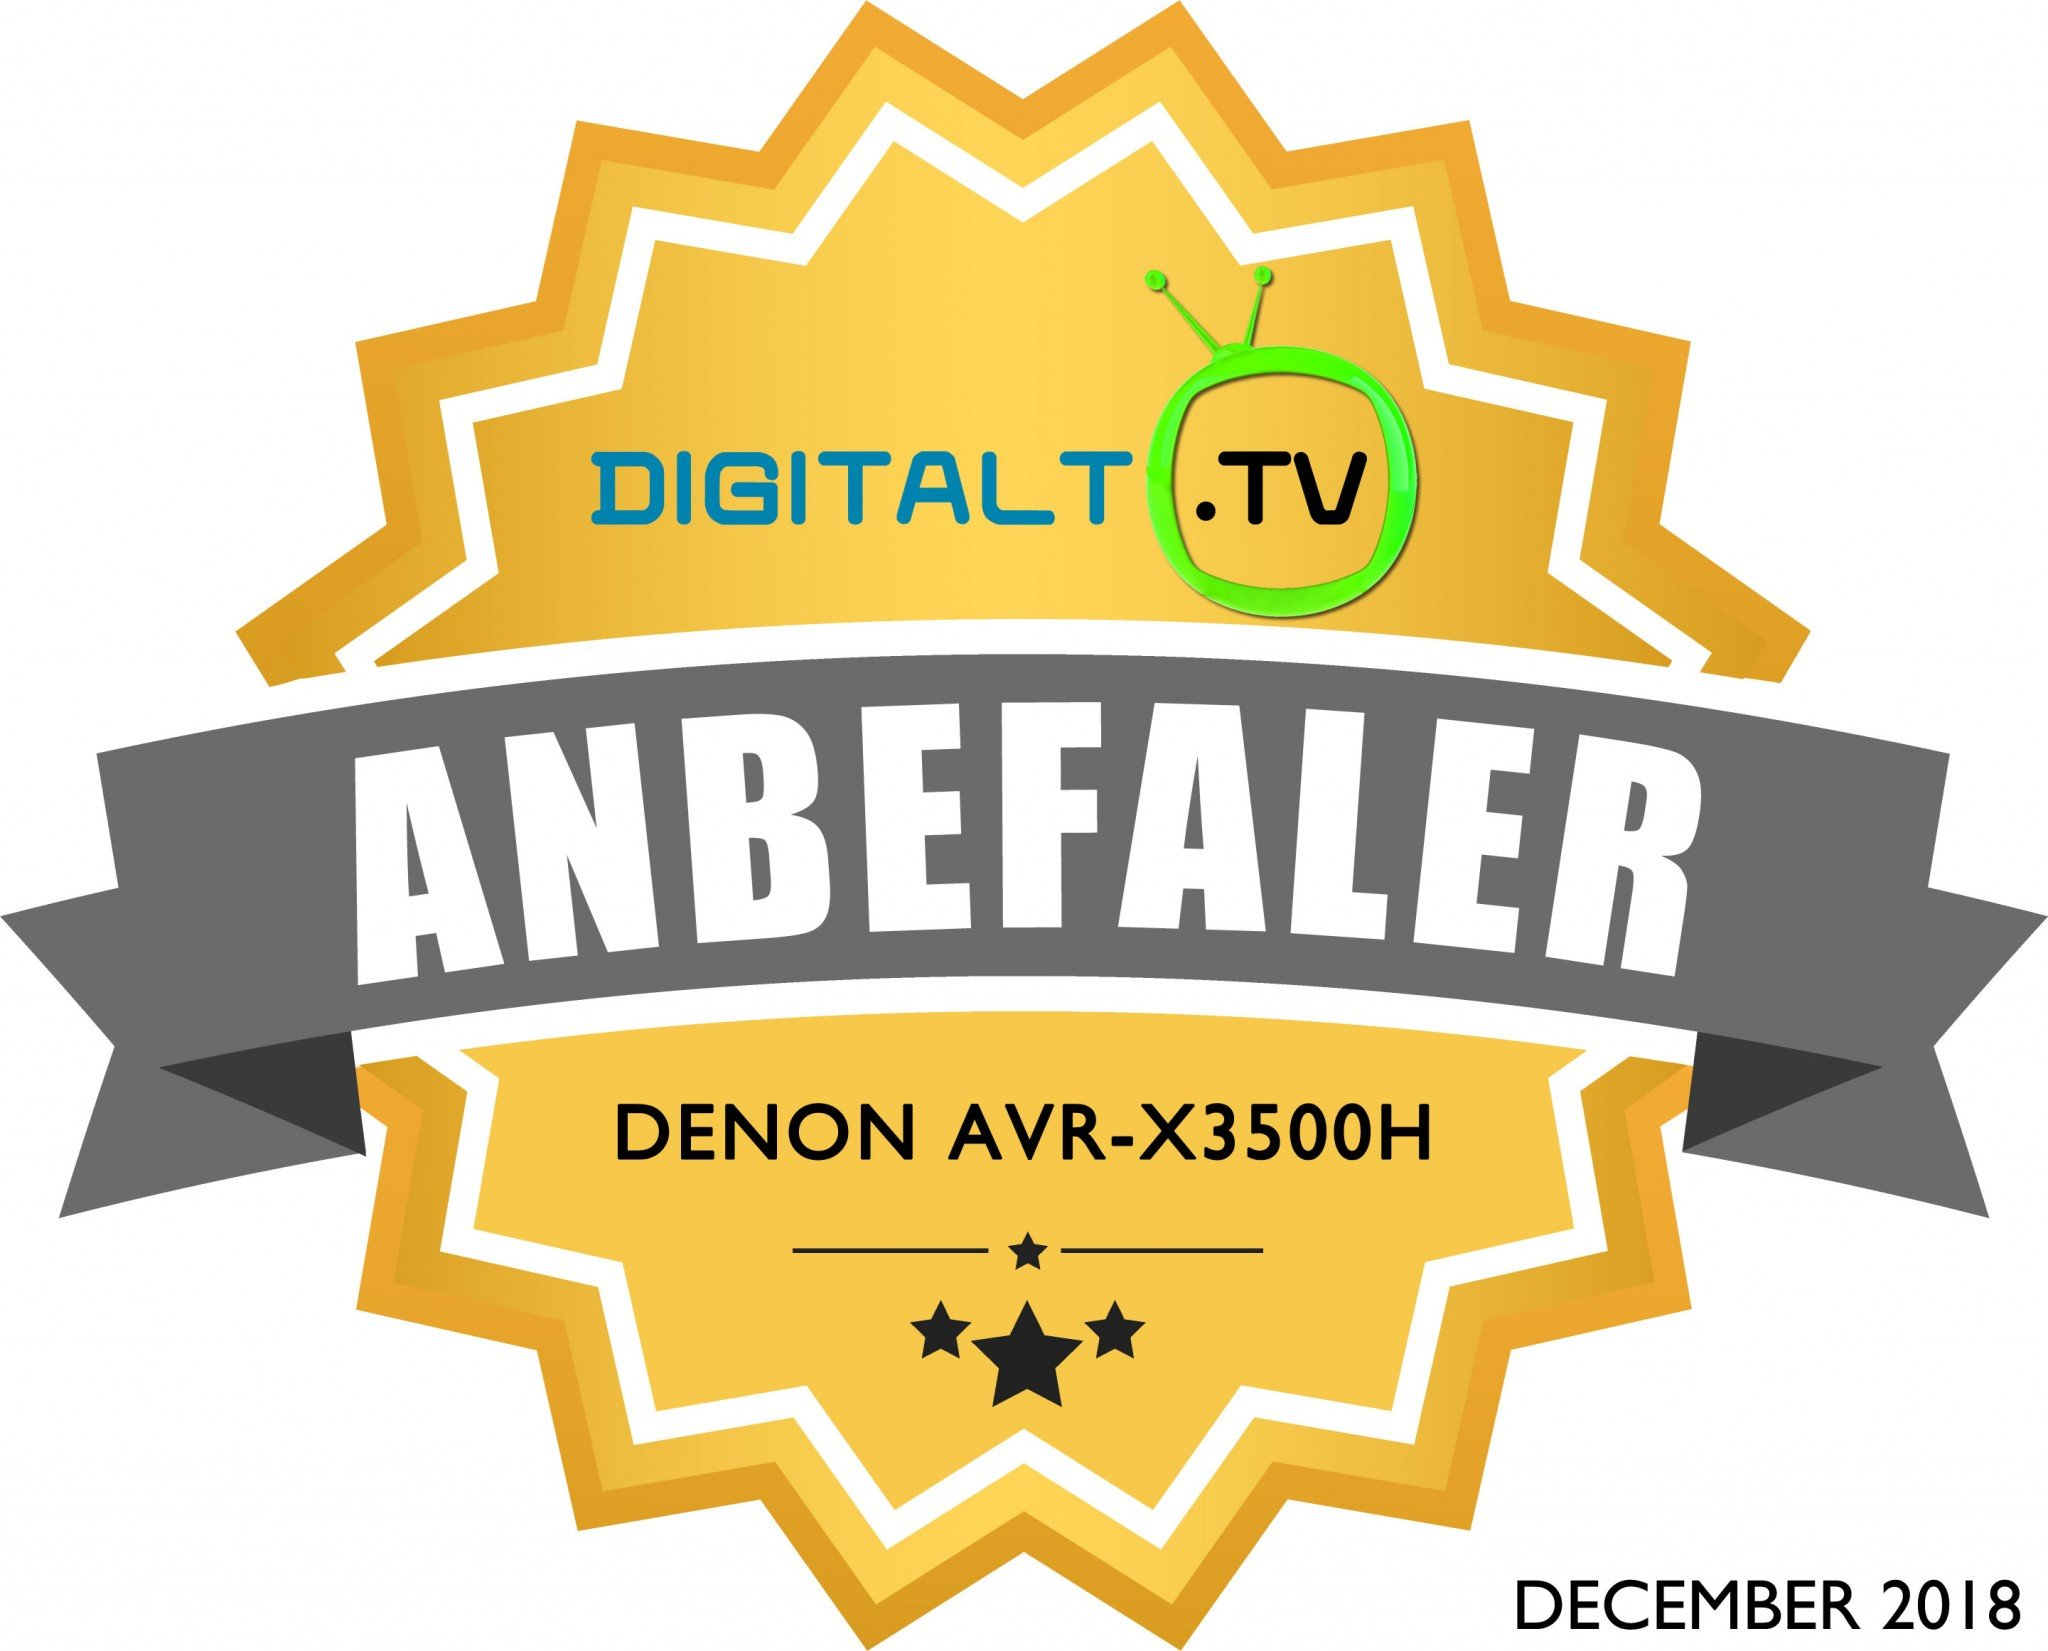 Denon AVR X3500H Logo anbefaling